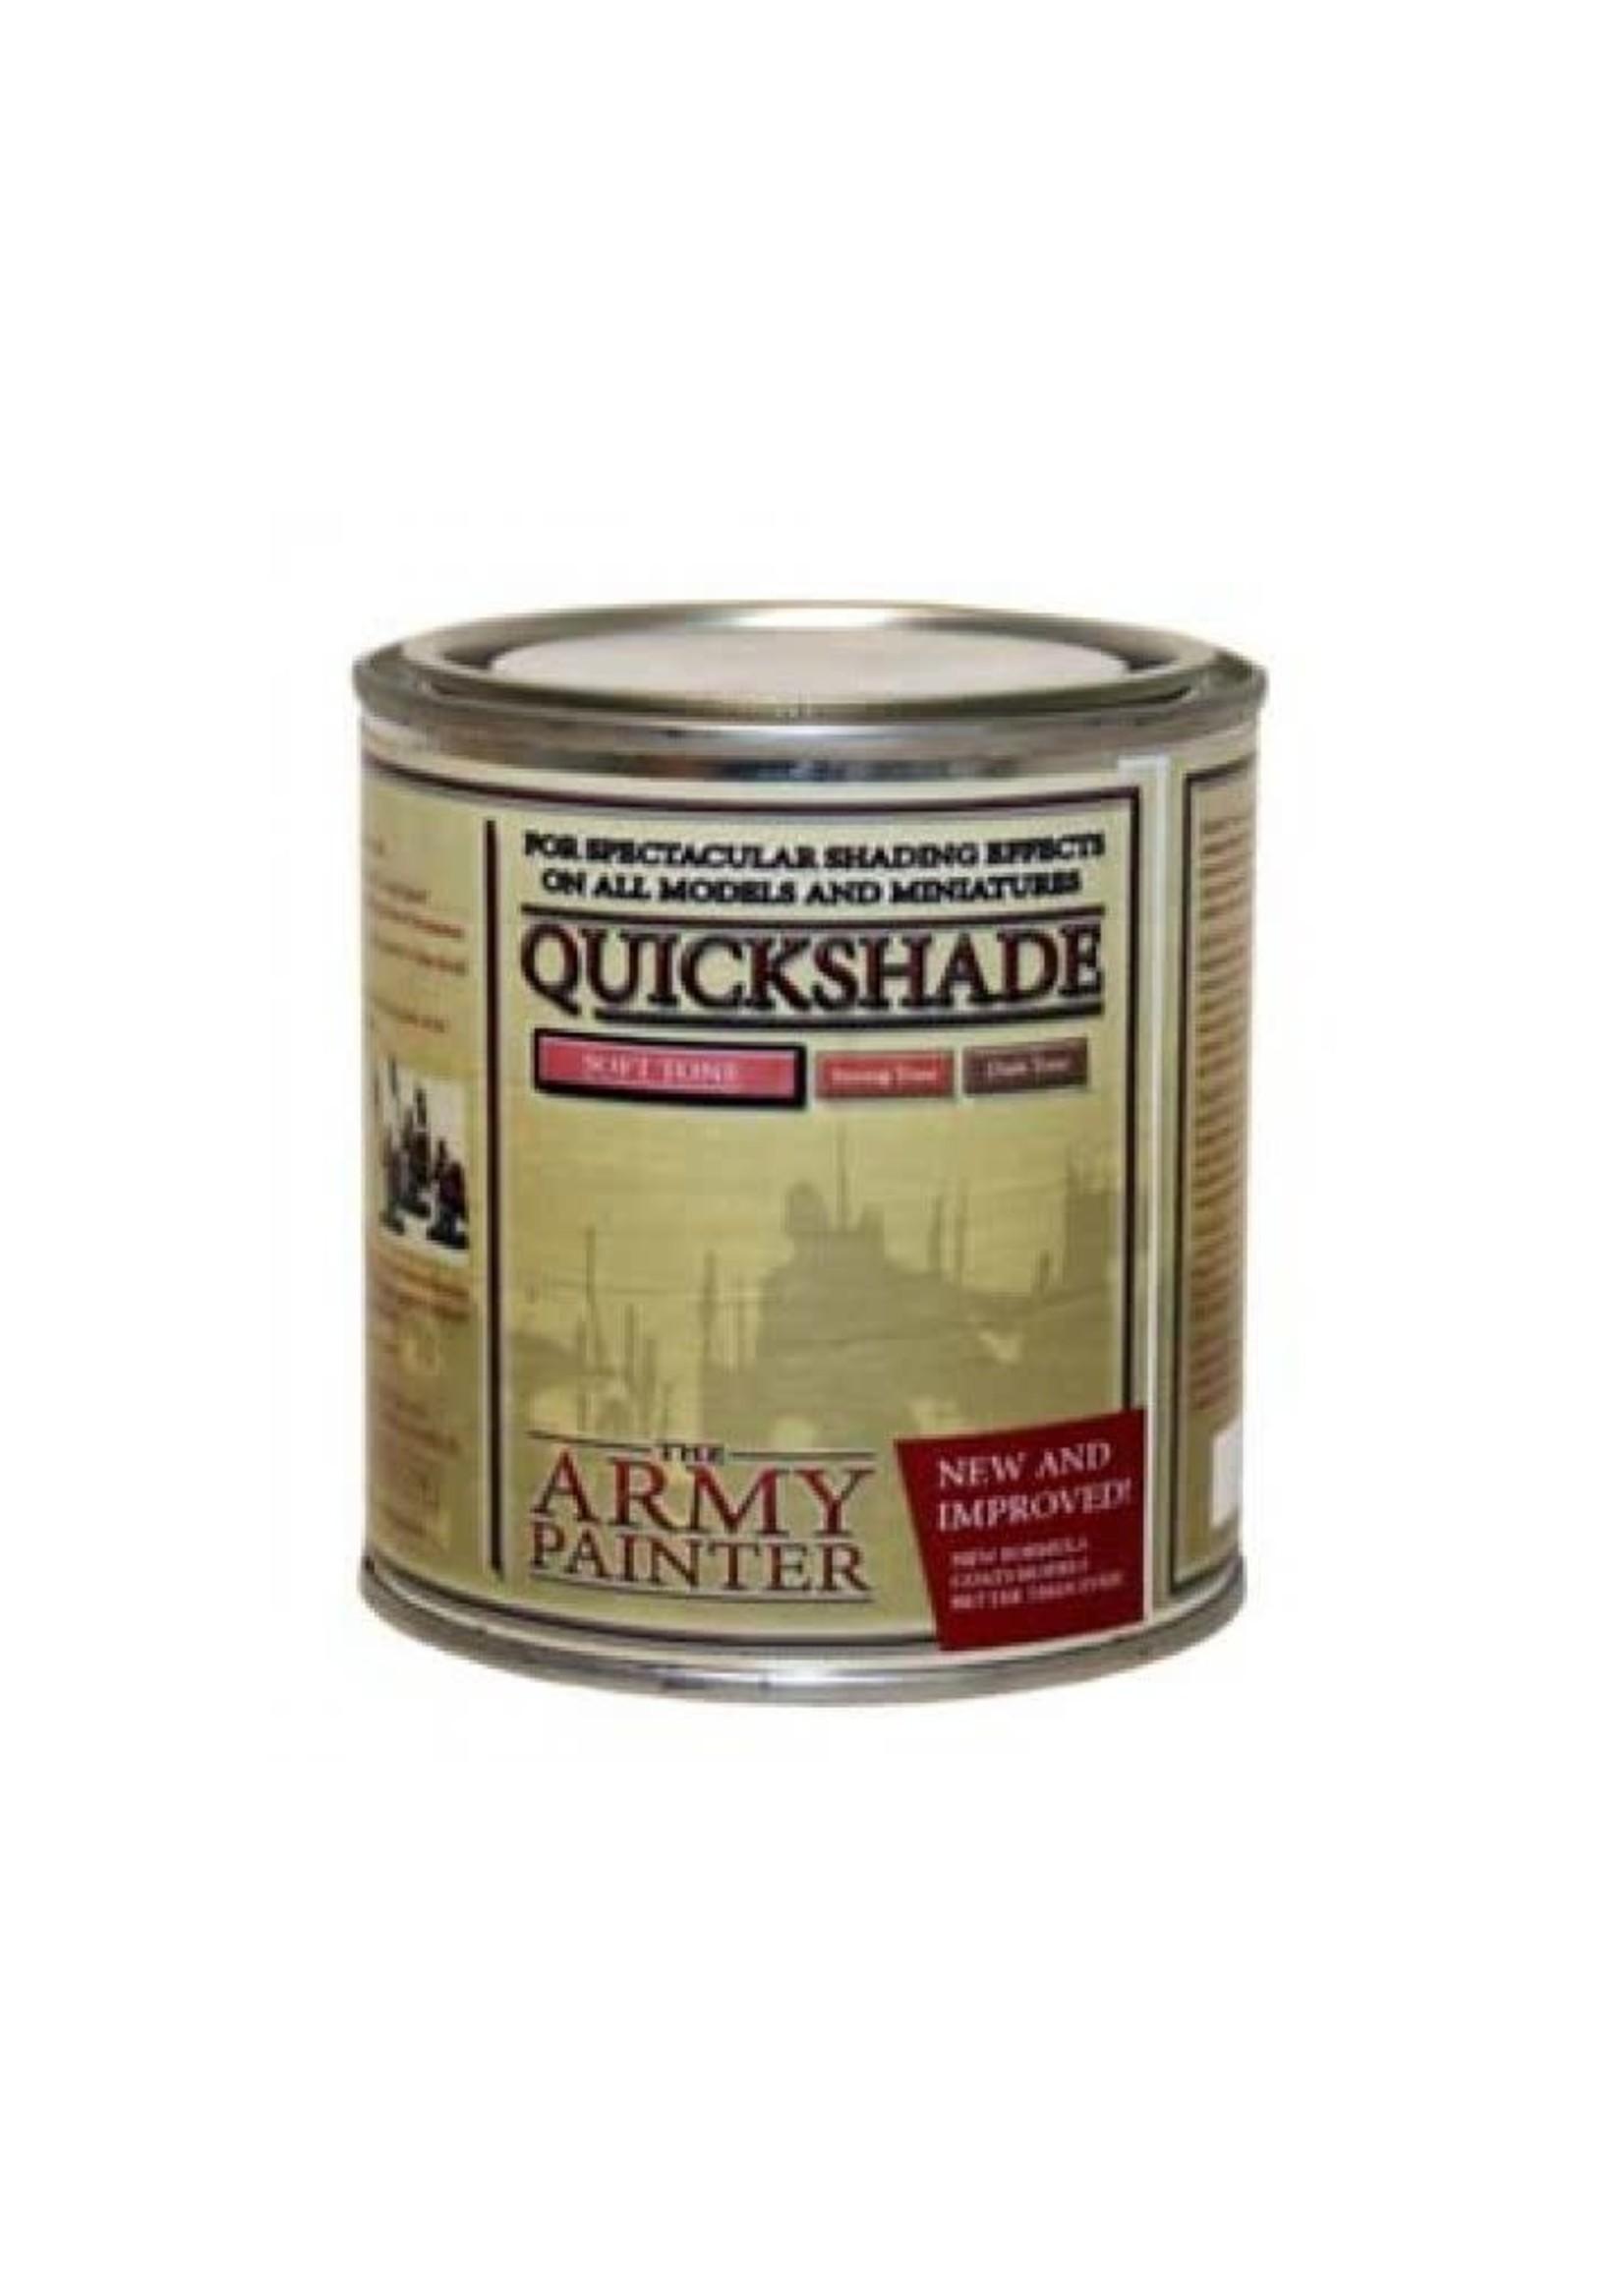 Army Painter: Quickshade Soft Tone